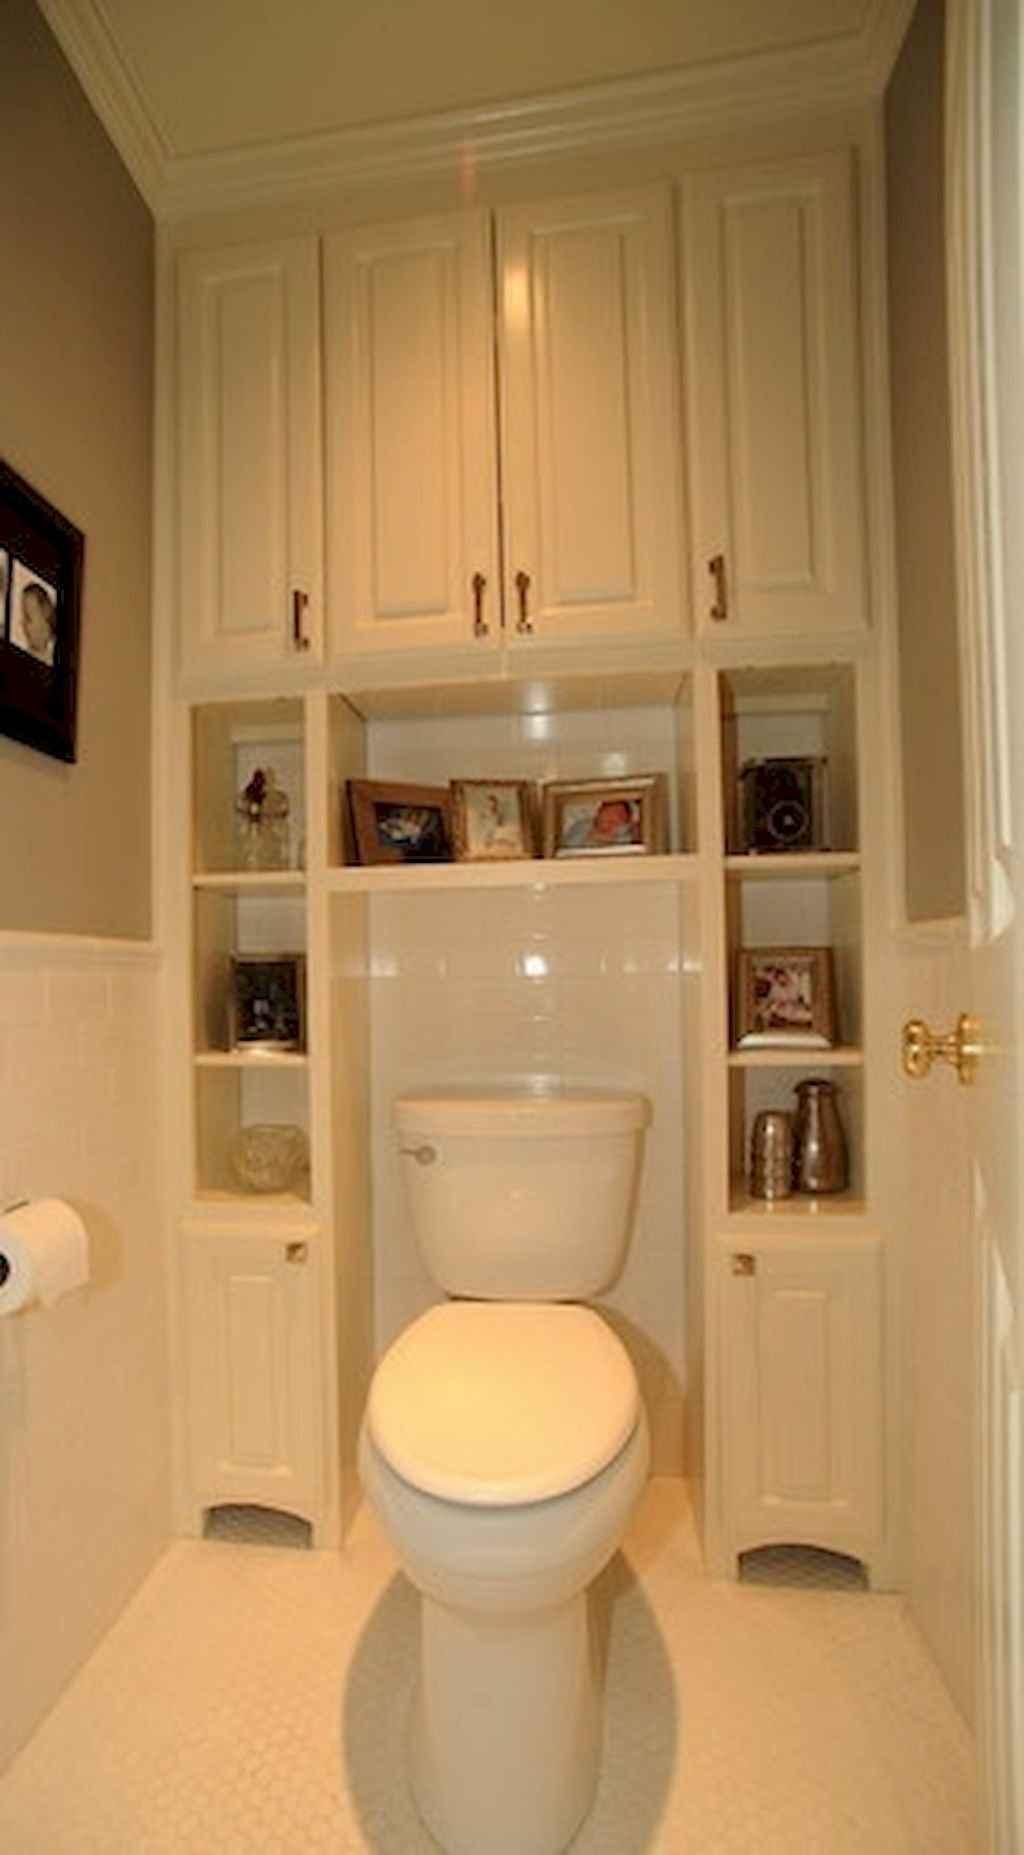 Inspiring apartment bathroom remodel ideas on a budget (4)